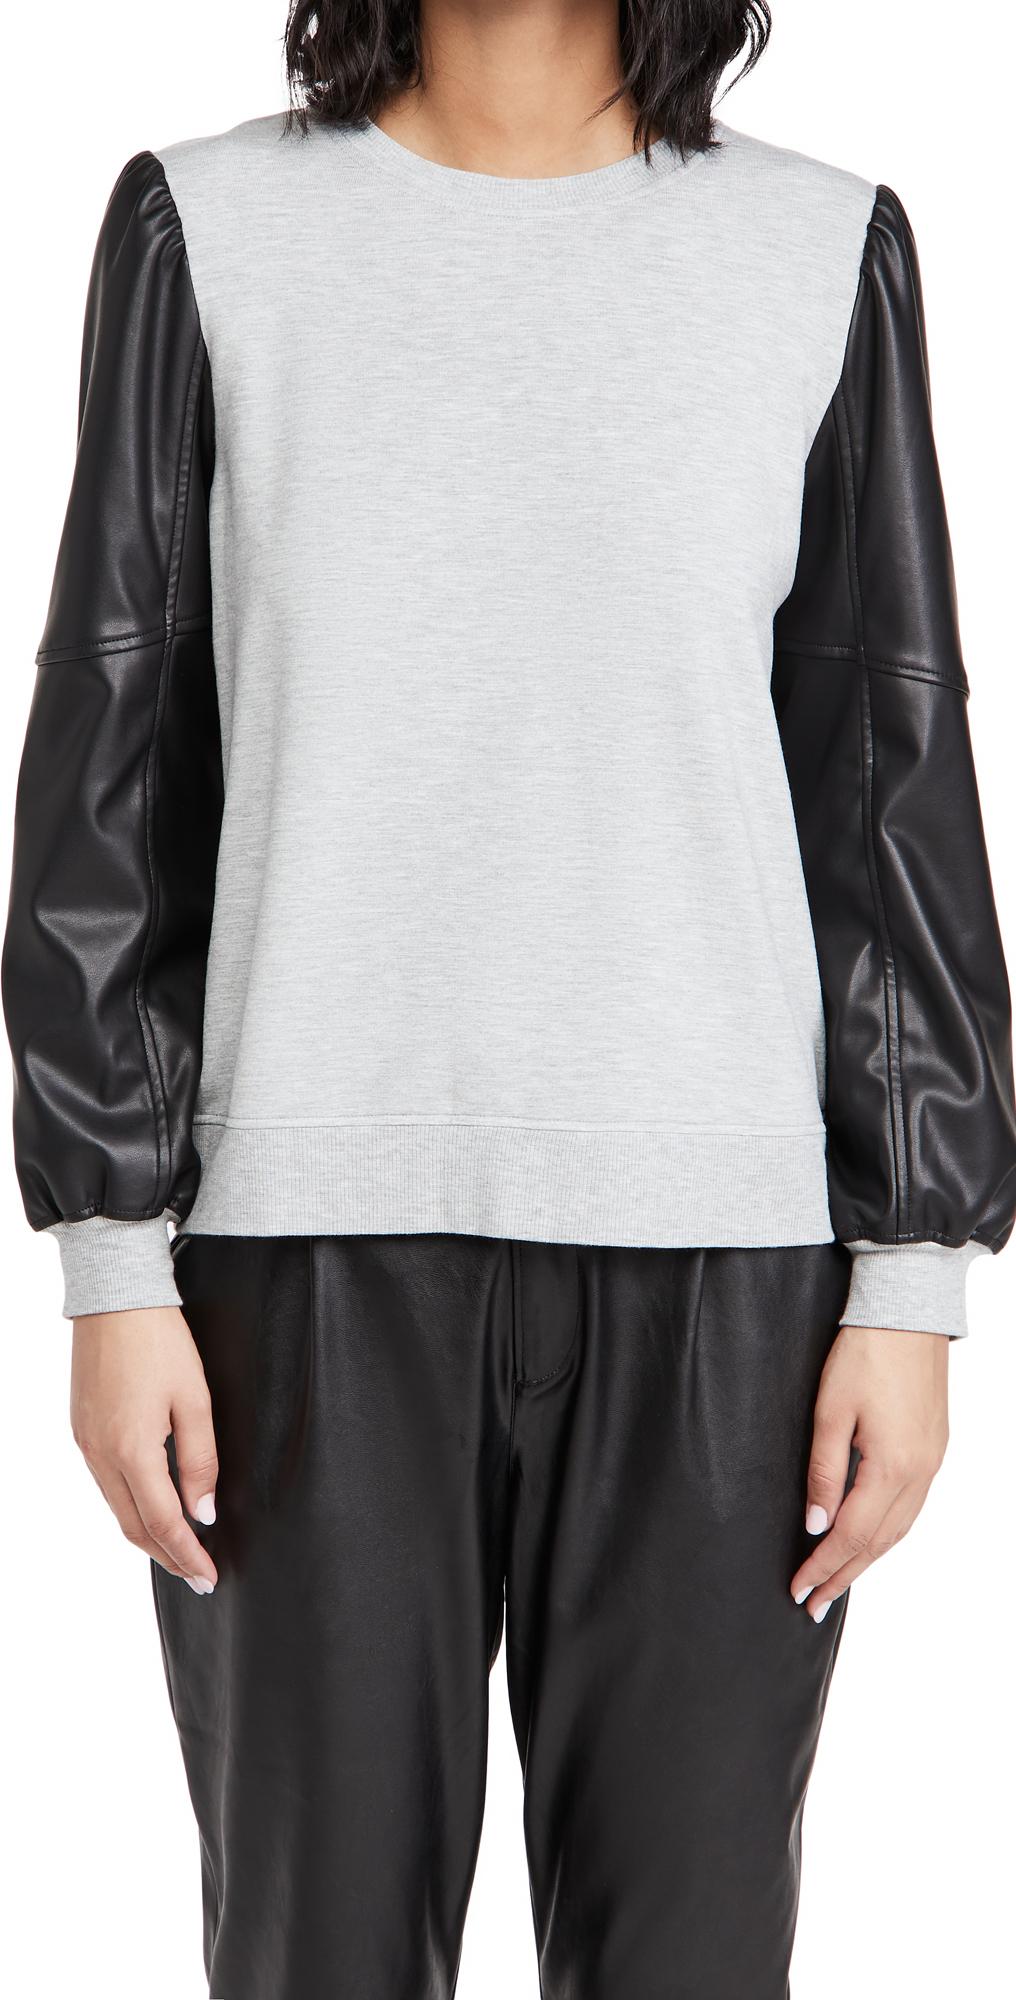 Generation Love Finley Sweatshirt